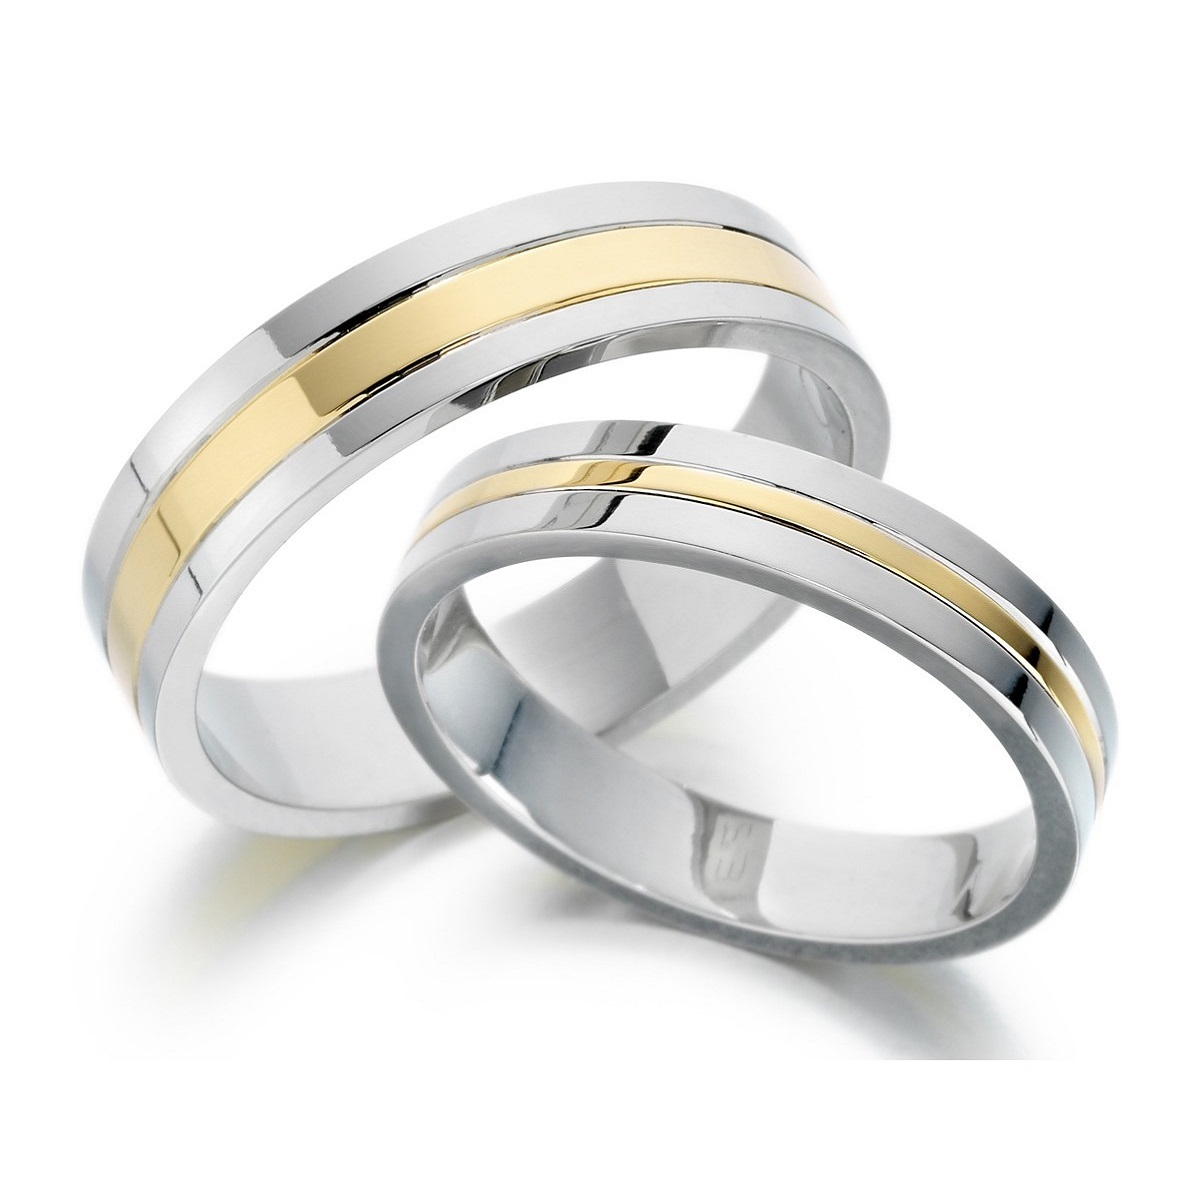 wedding matching wedding band sets Matching wedding band set with rose gold center lining